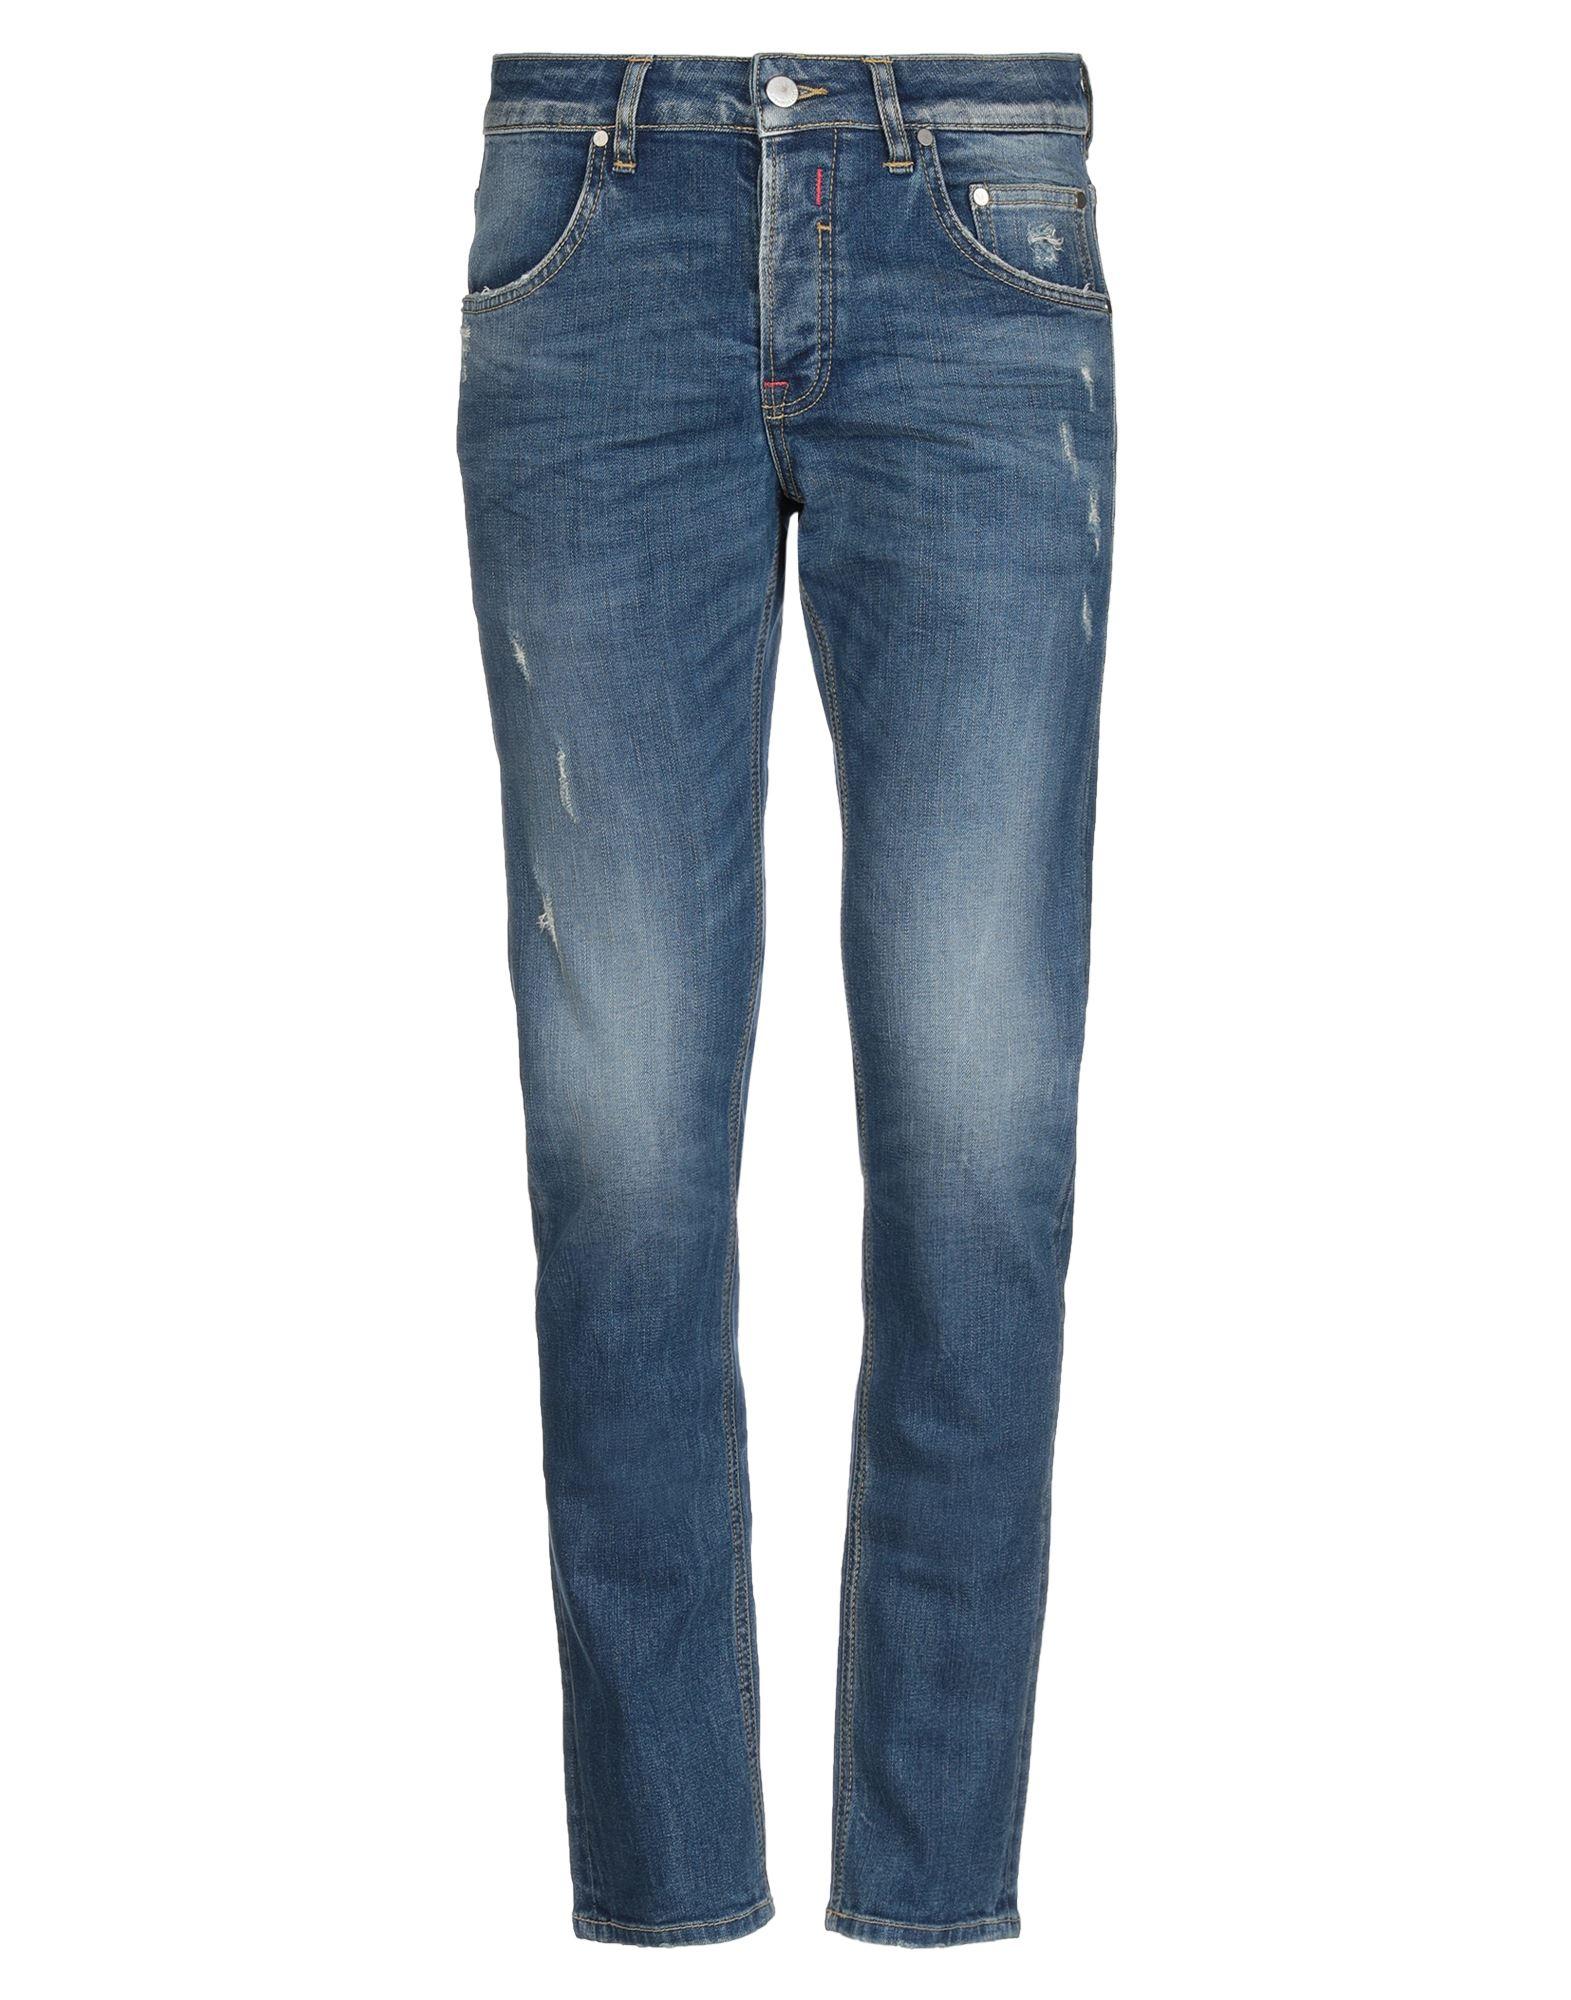 Фото - BRIAN DALES & LTB Джинсовые брюки brian dales джинсовые бермуды